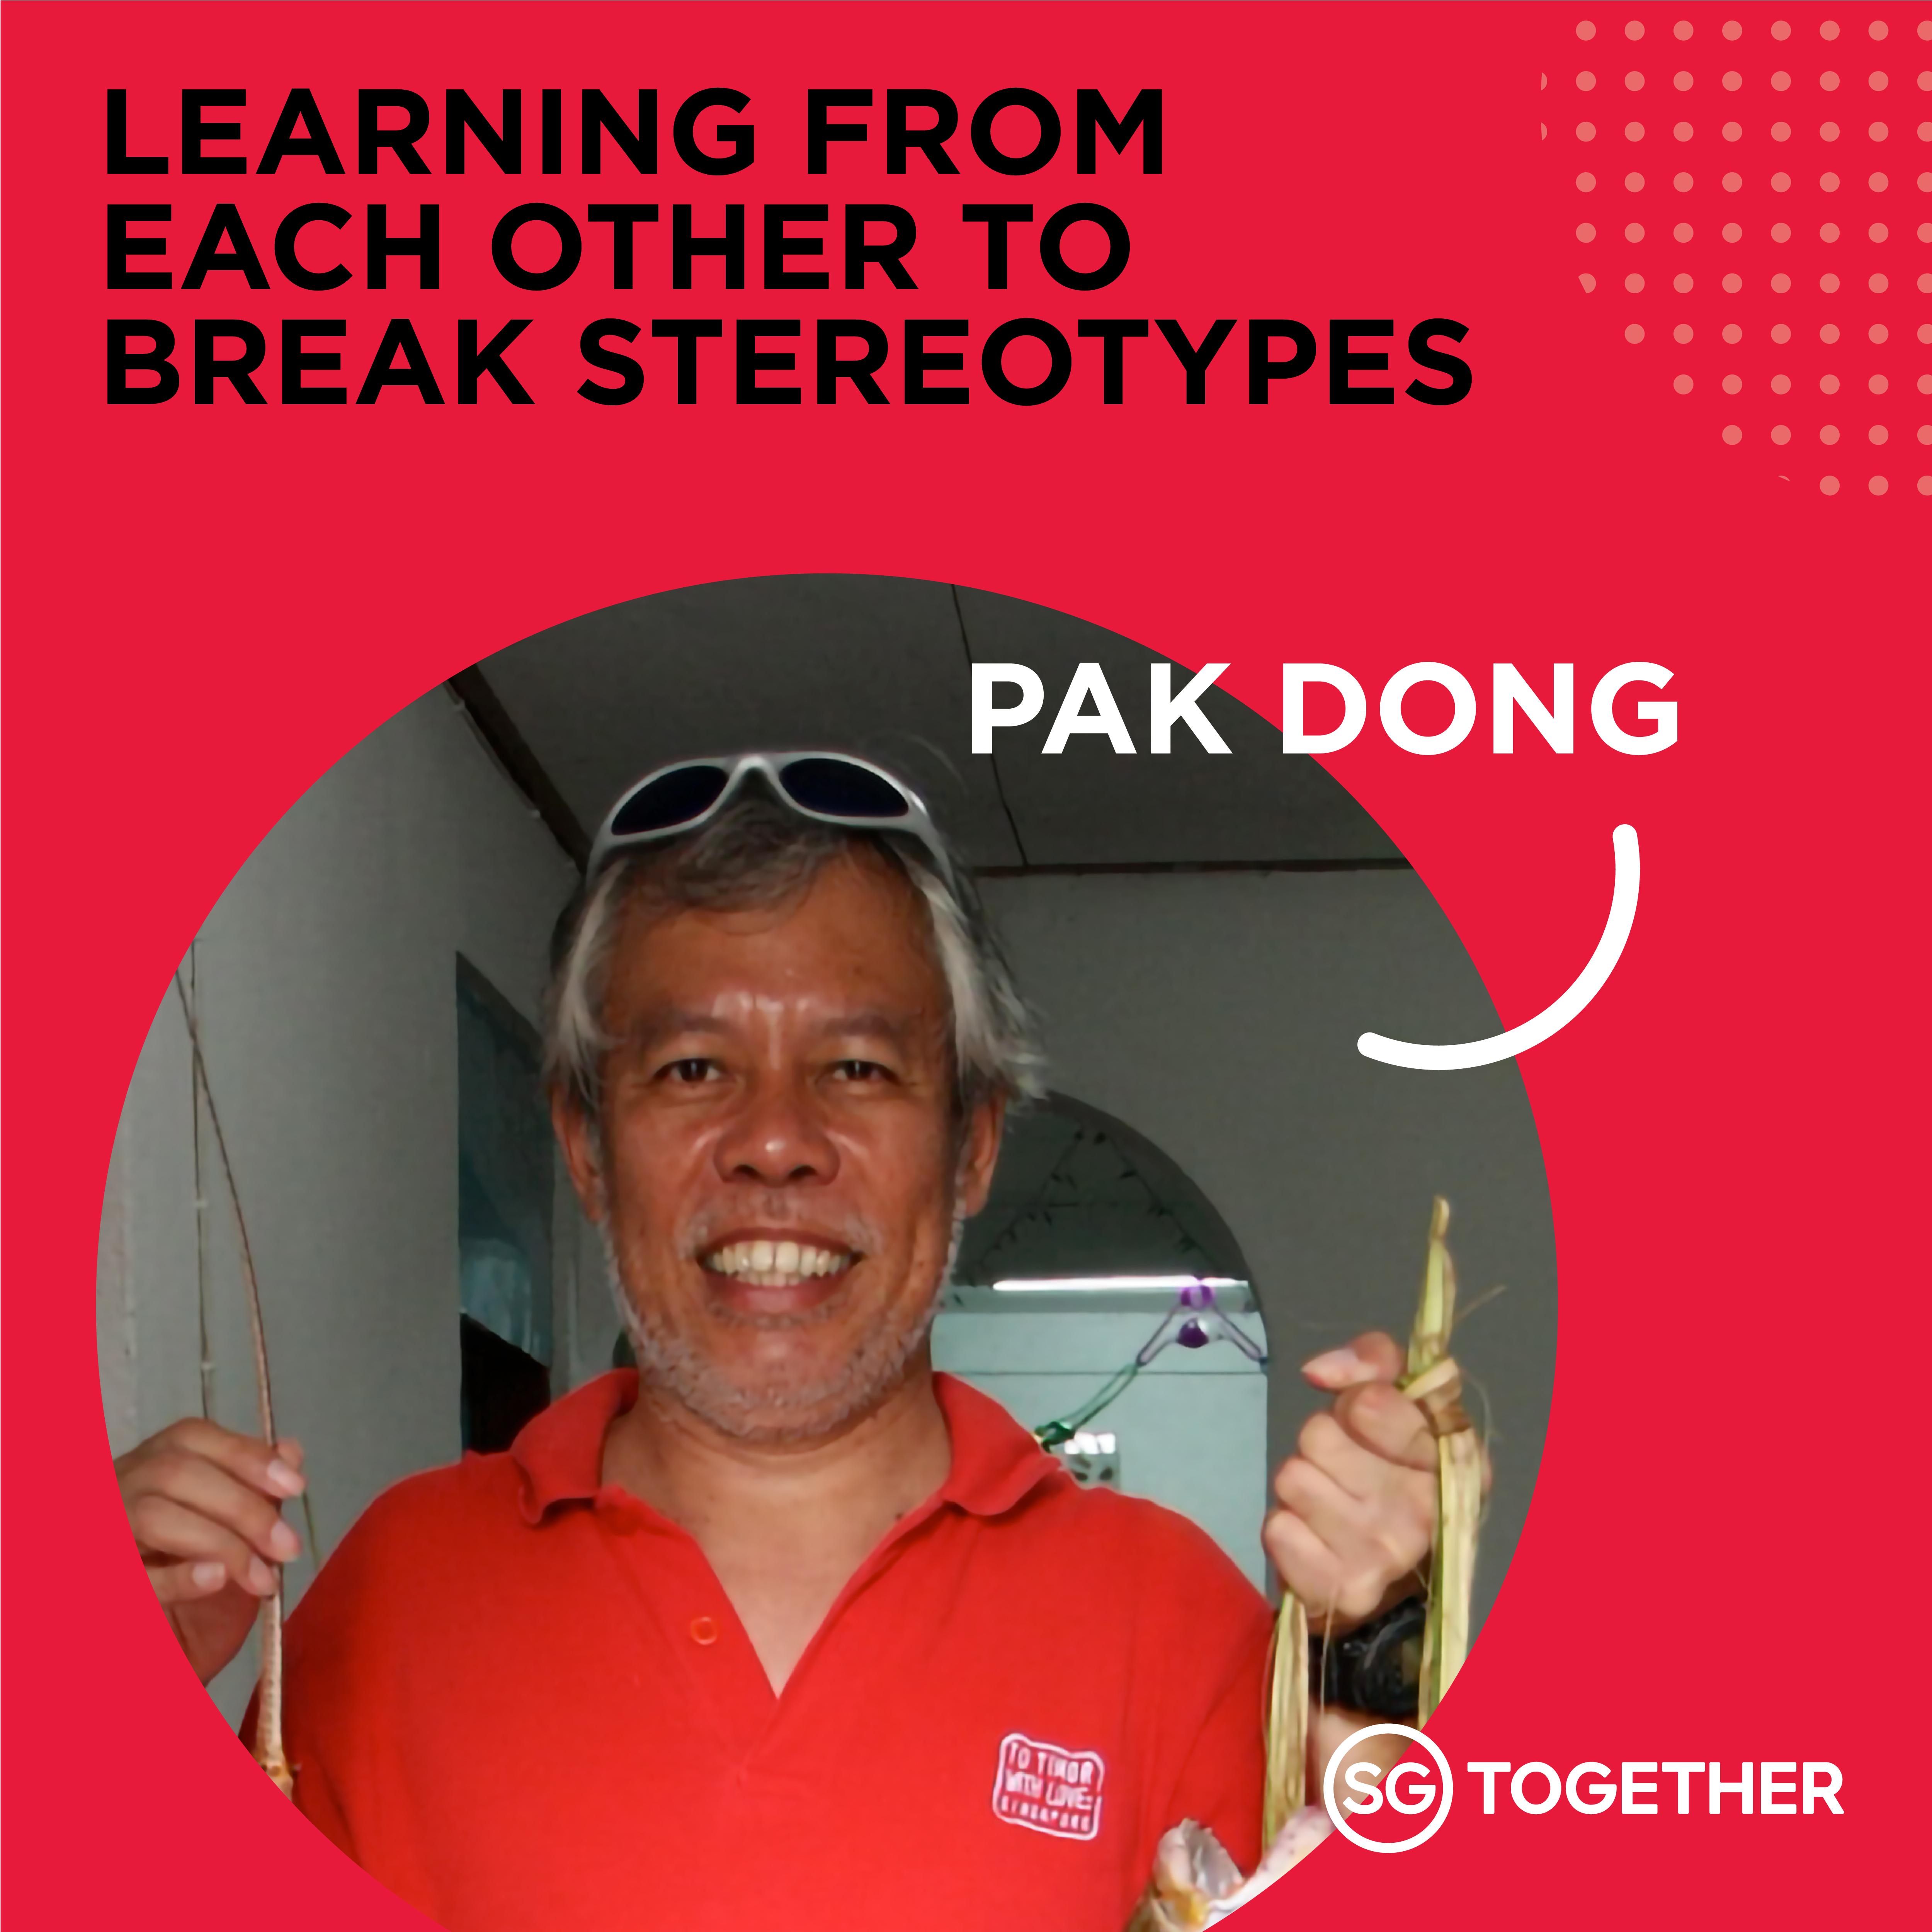 Pak Dong